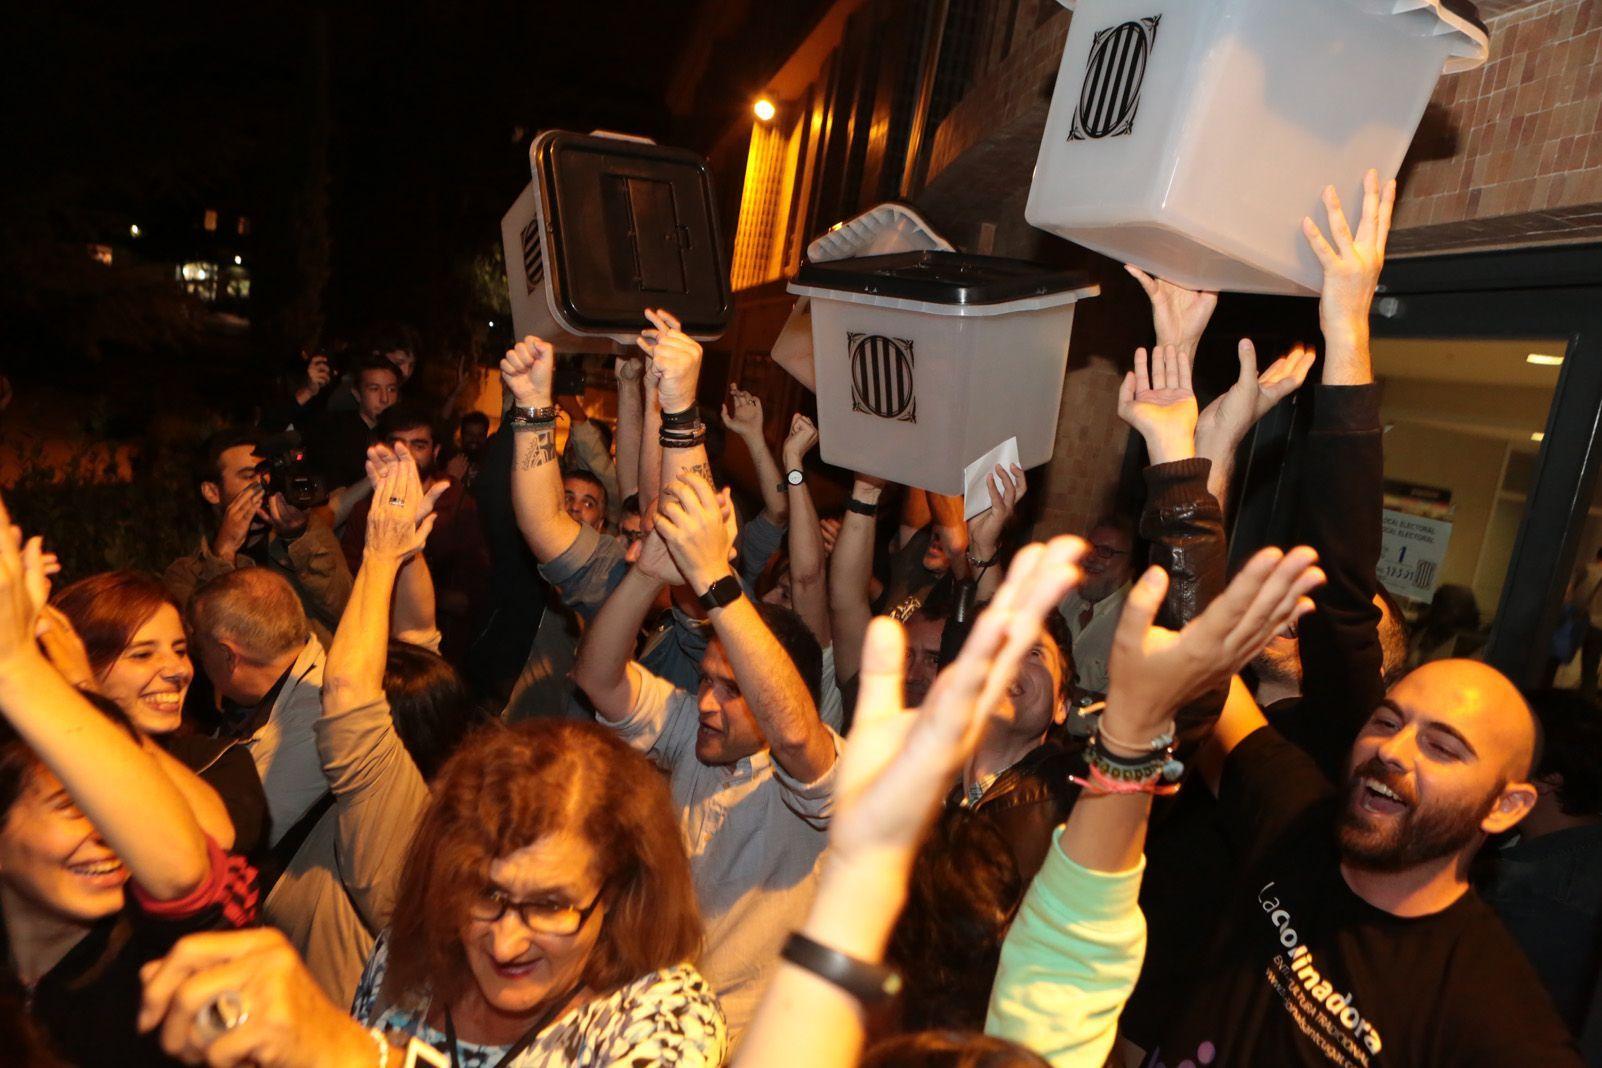 Celebració hem votat. Foto: Artur Rivera